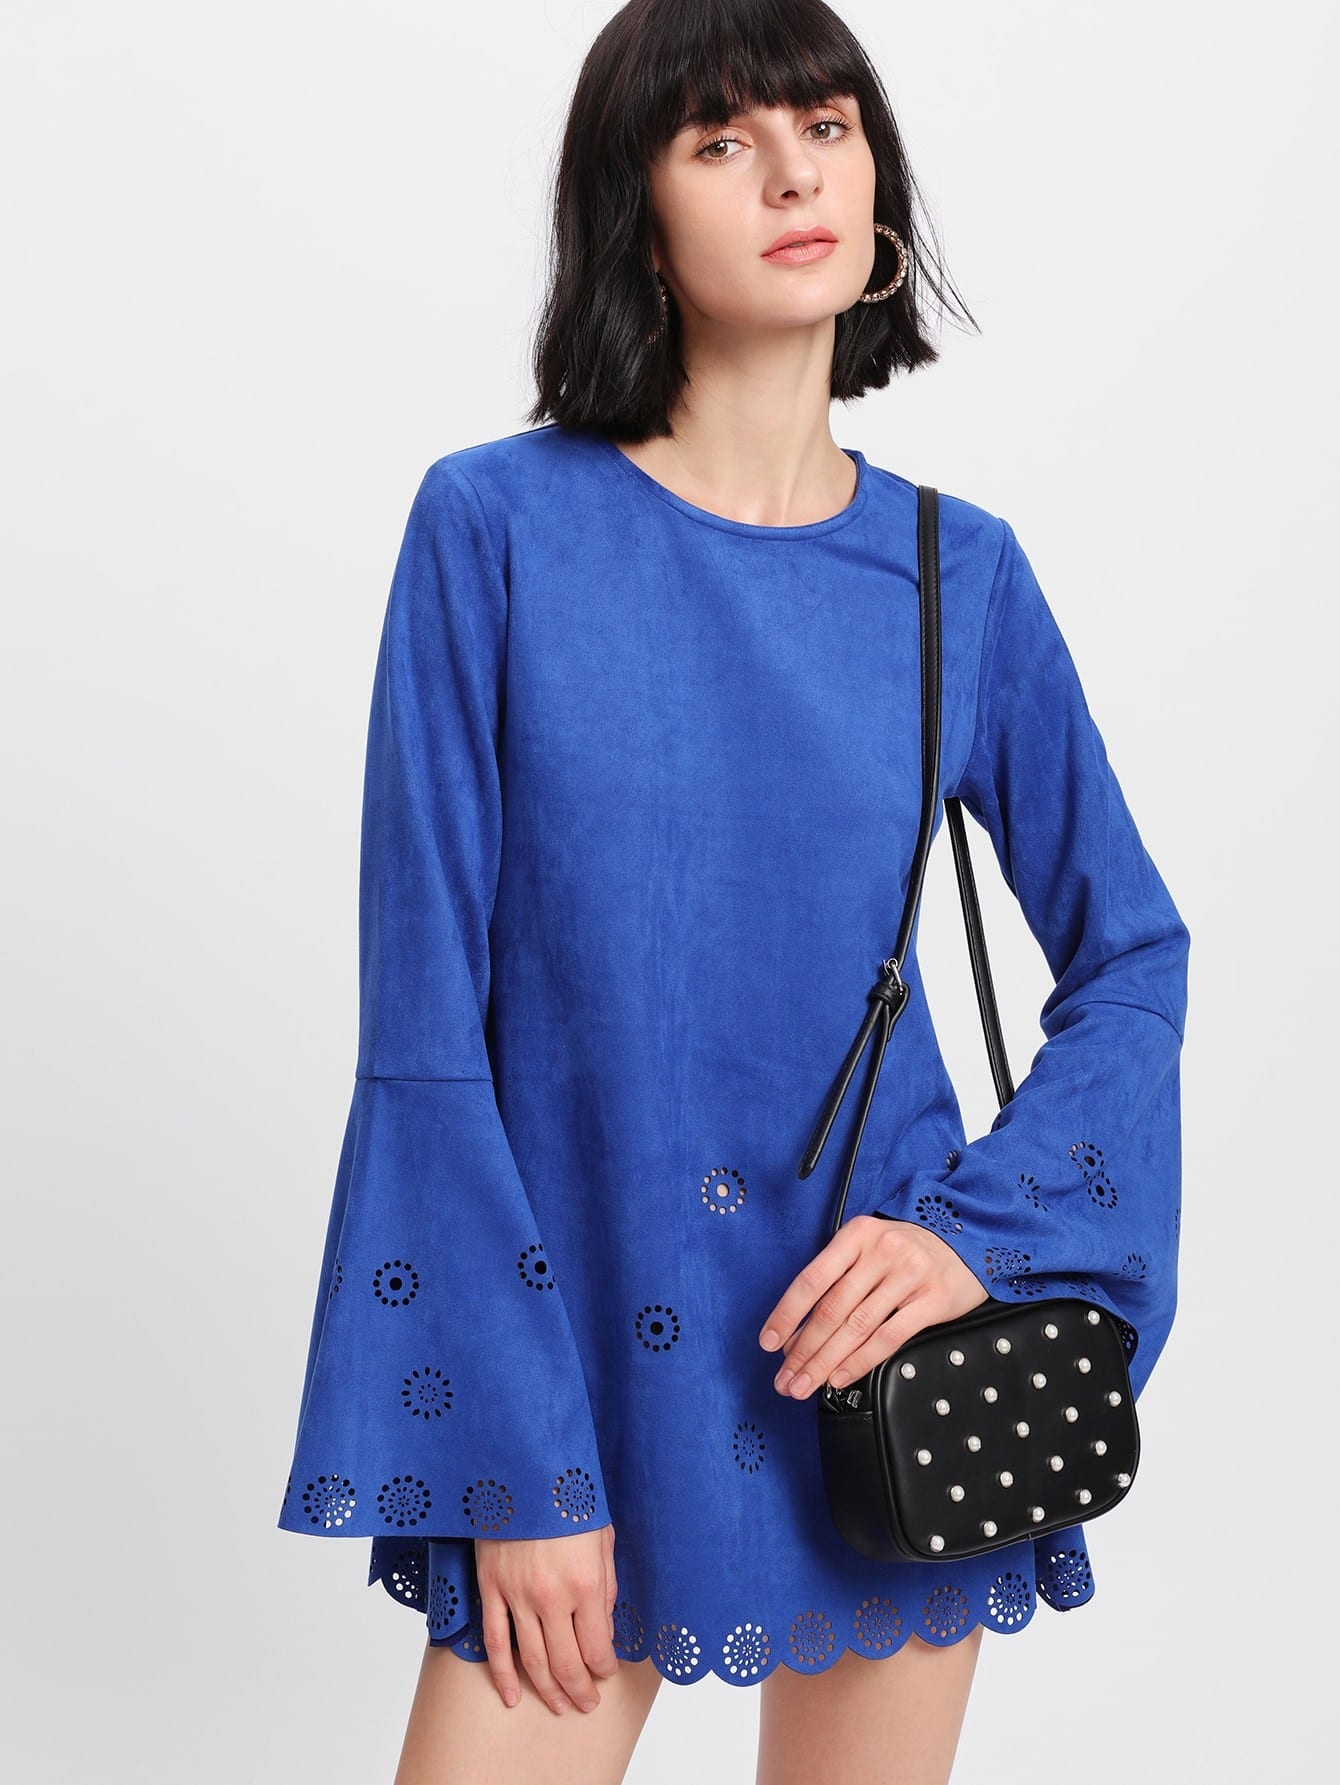 Scallop Laser Cut Suede Dress scallop laser cut form fitting dress